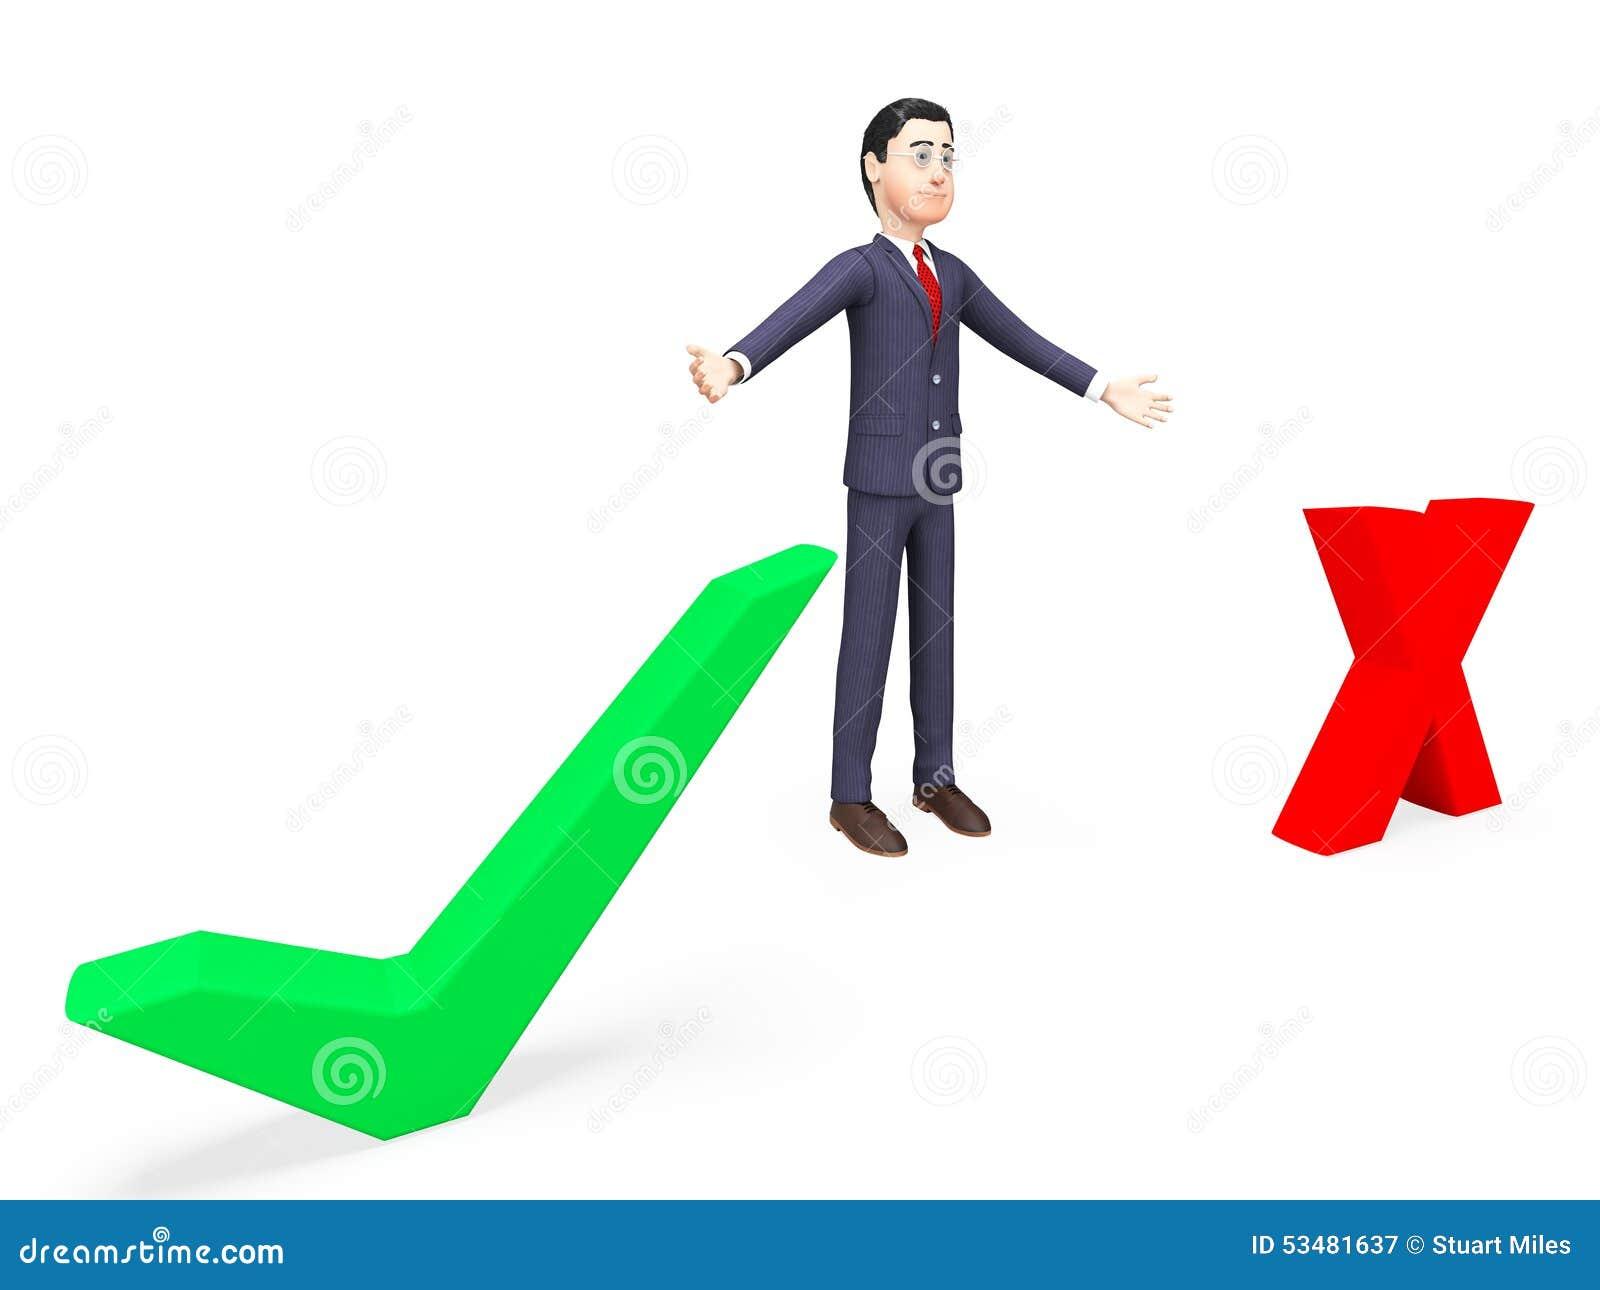 Stock options s corporation